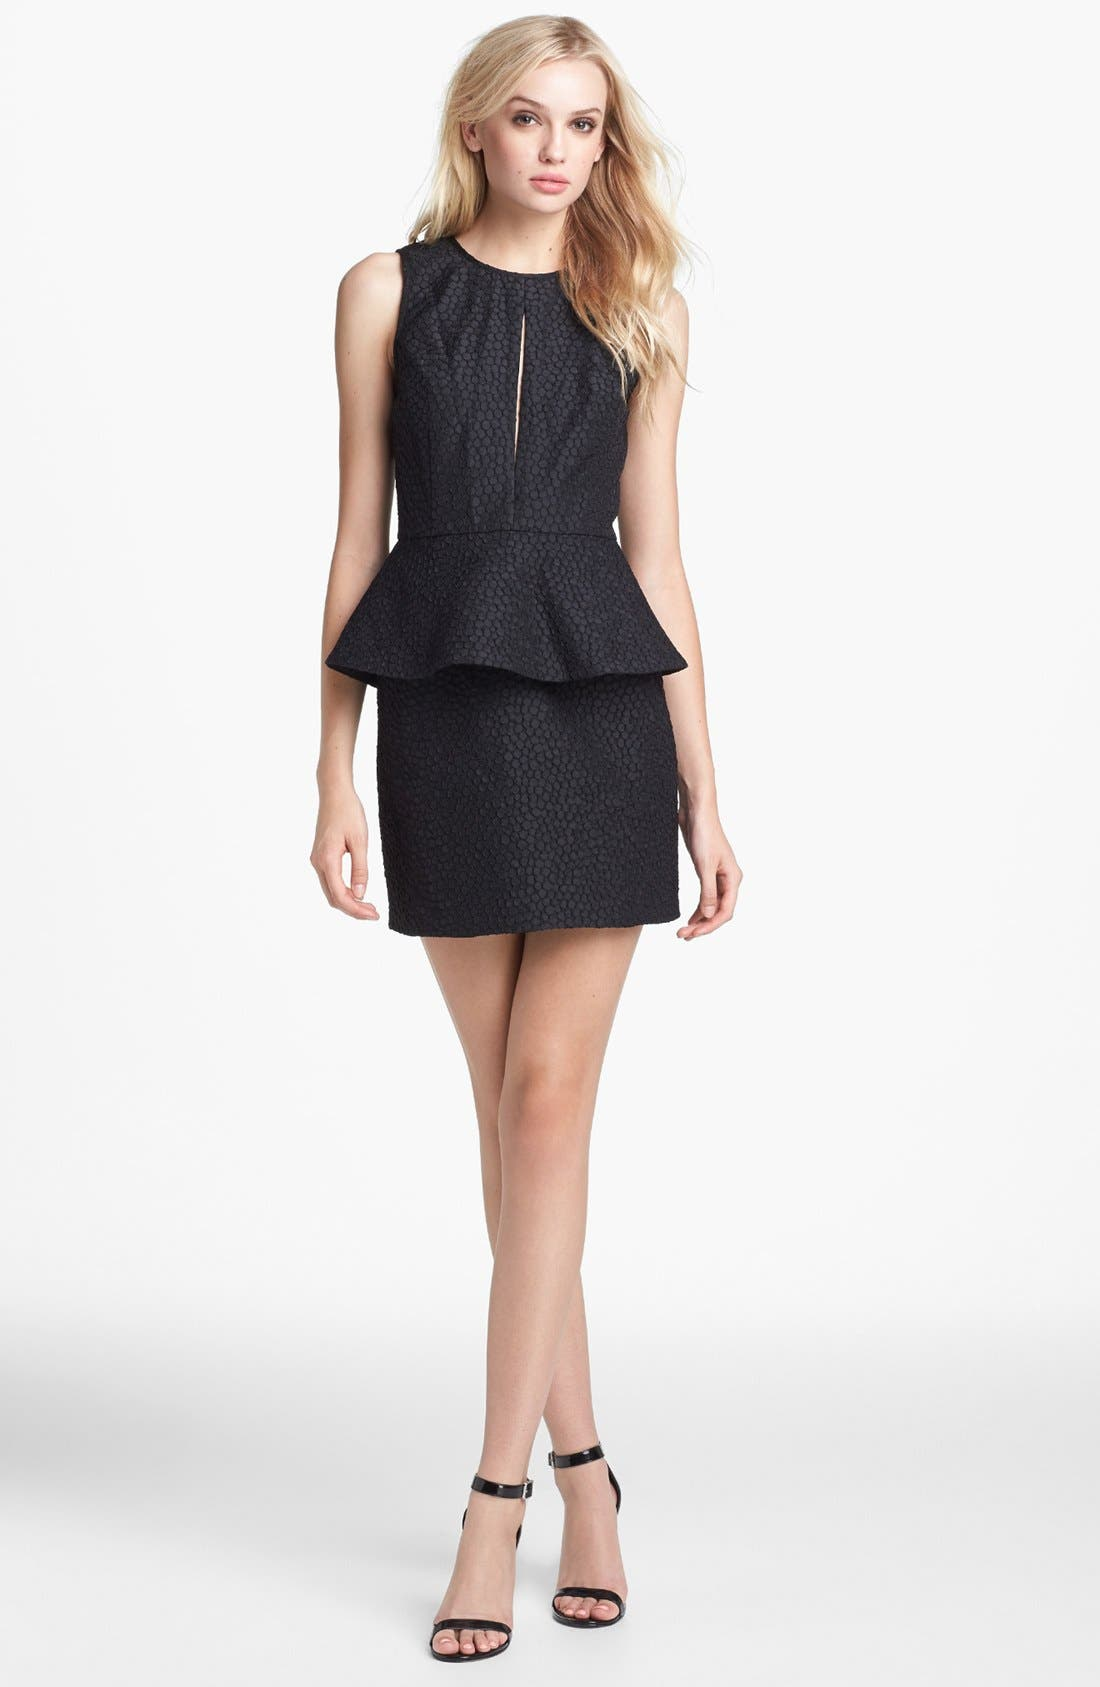 Main Image - Keepsake the Label 'In Your Light' Jacquard Peplum Sheath Dress